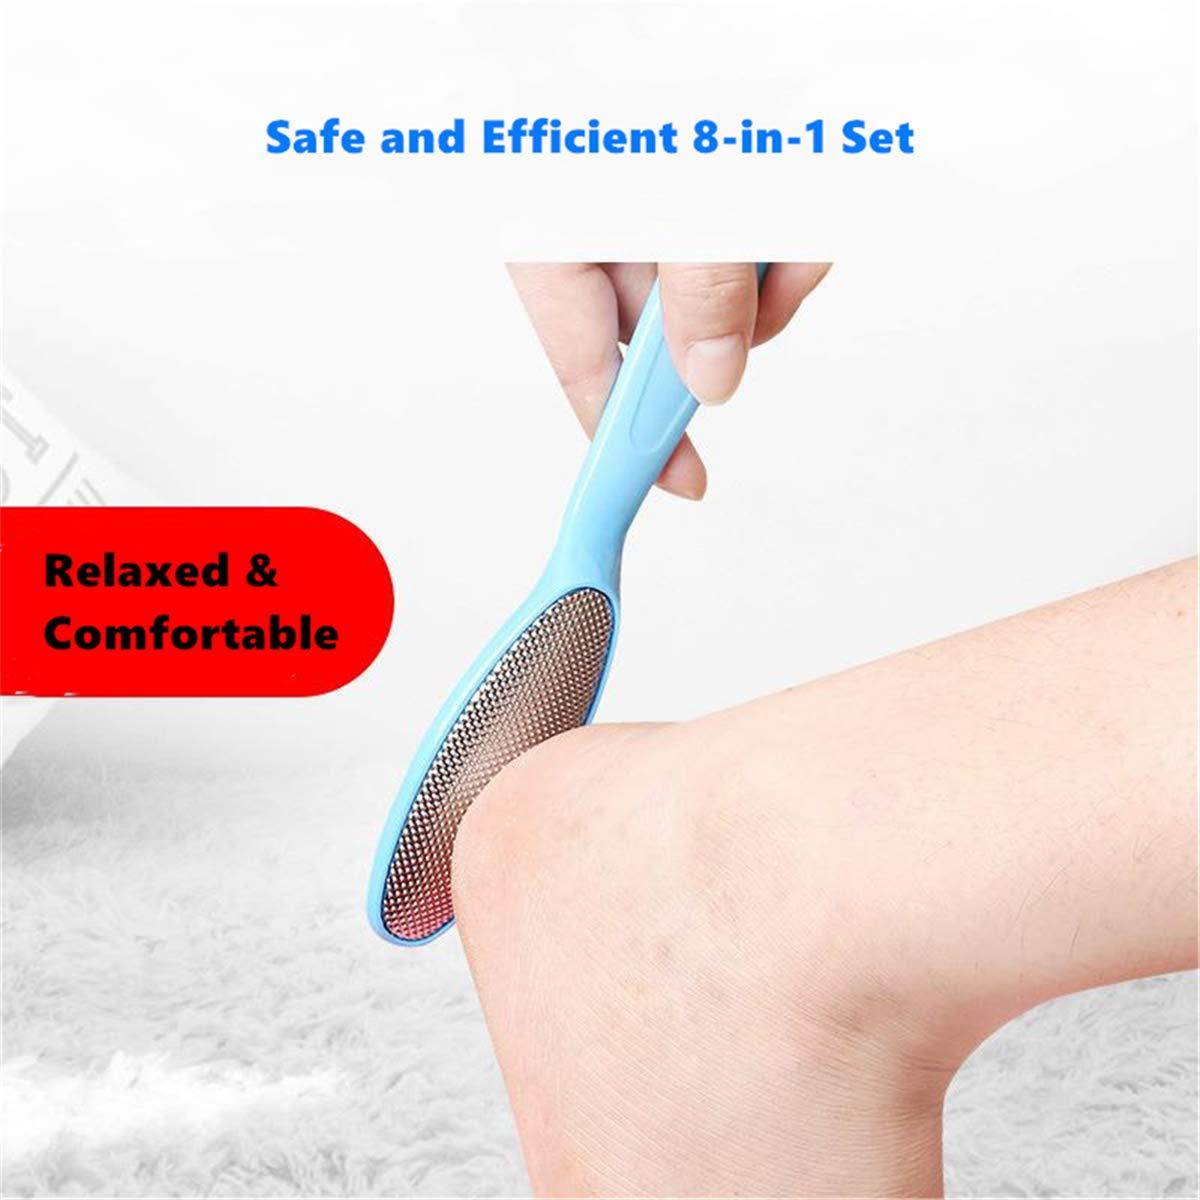 Foot File Pedicure Rasp Pedicure Tools Foot Care Pedicure Callus Remover Professional Stainless